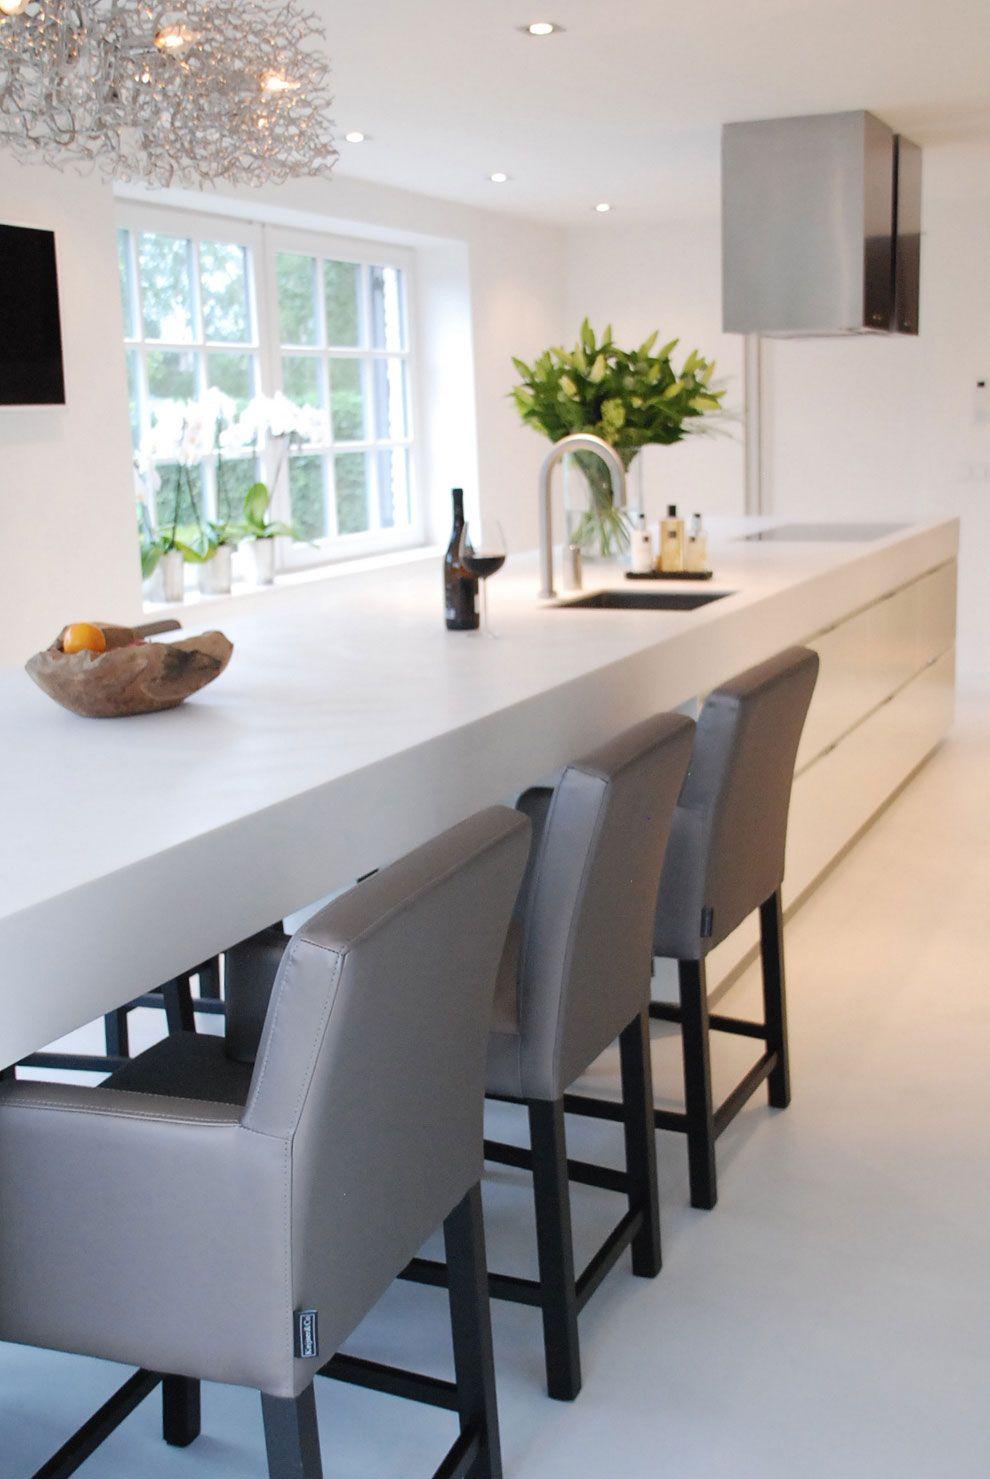 best images about keuken on pinterest spotlight island bench